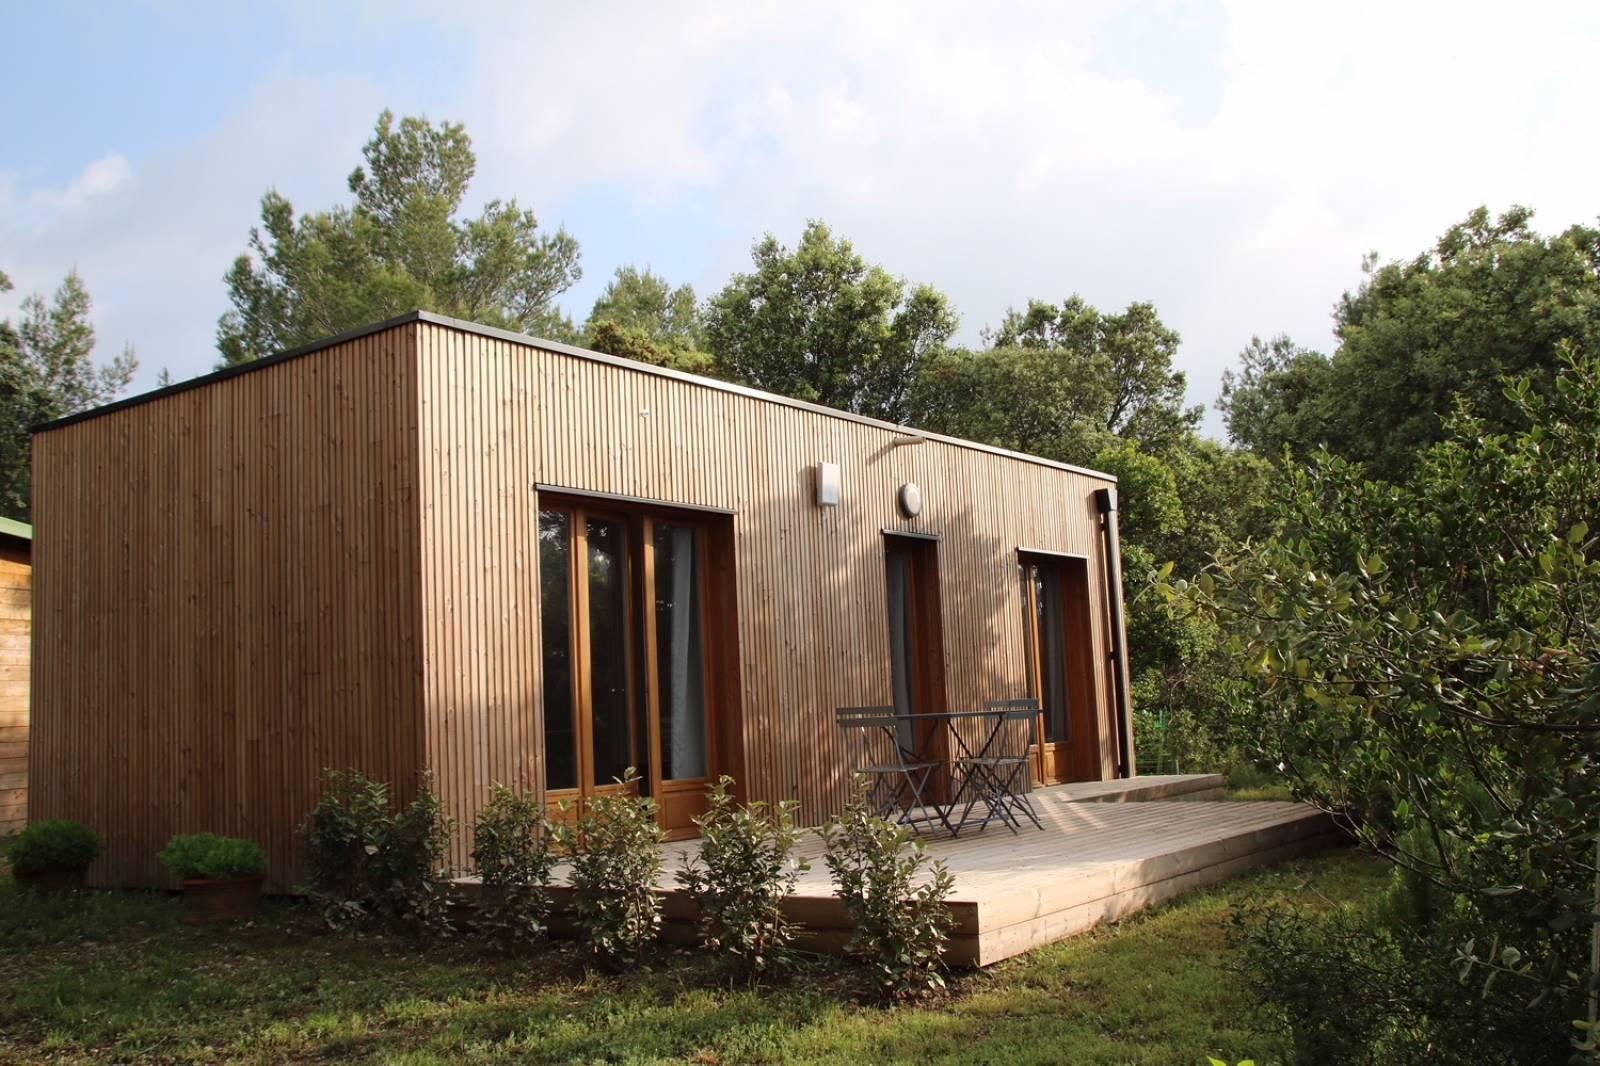 Construction D'un Studio De Jardin Habitable En Bois À Aix ... tout Studio De Jardin Habitable